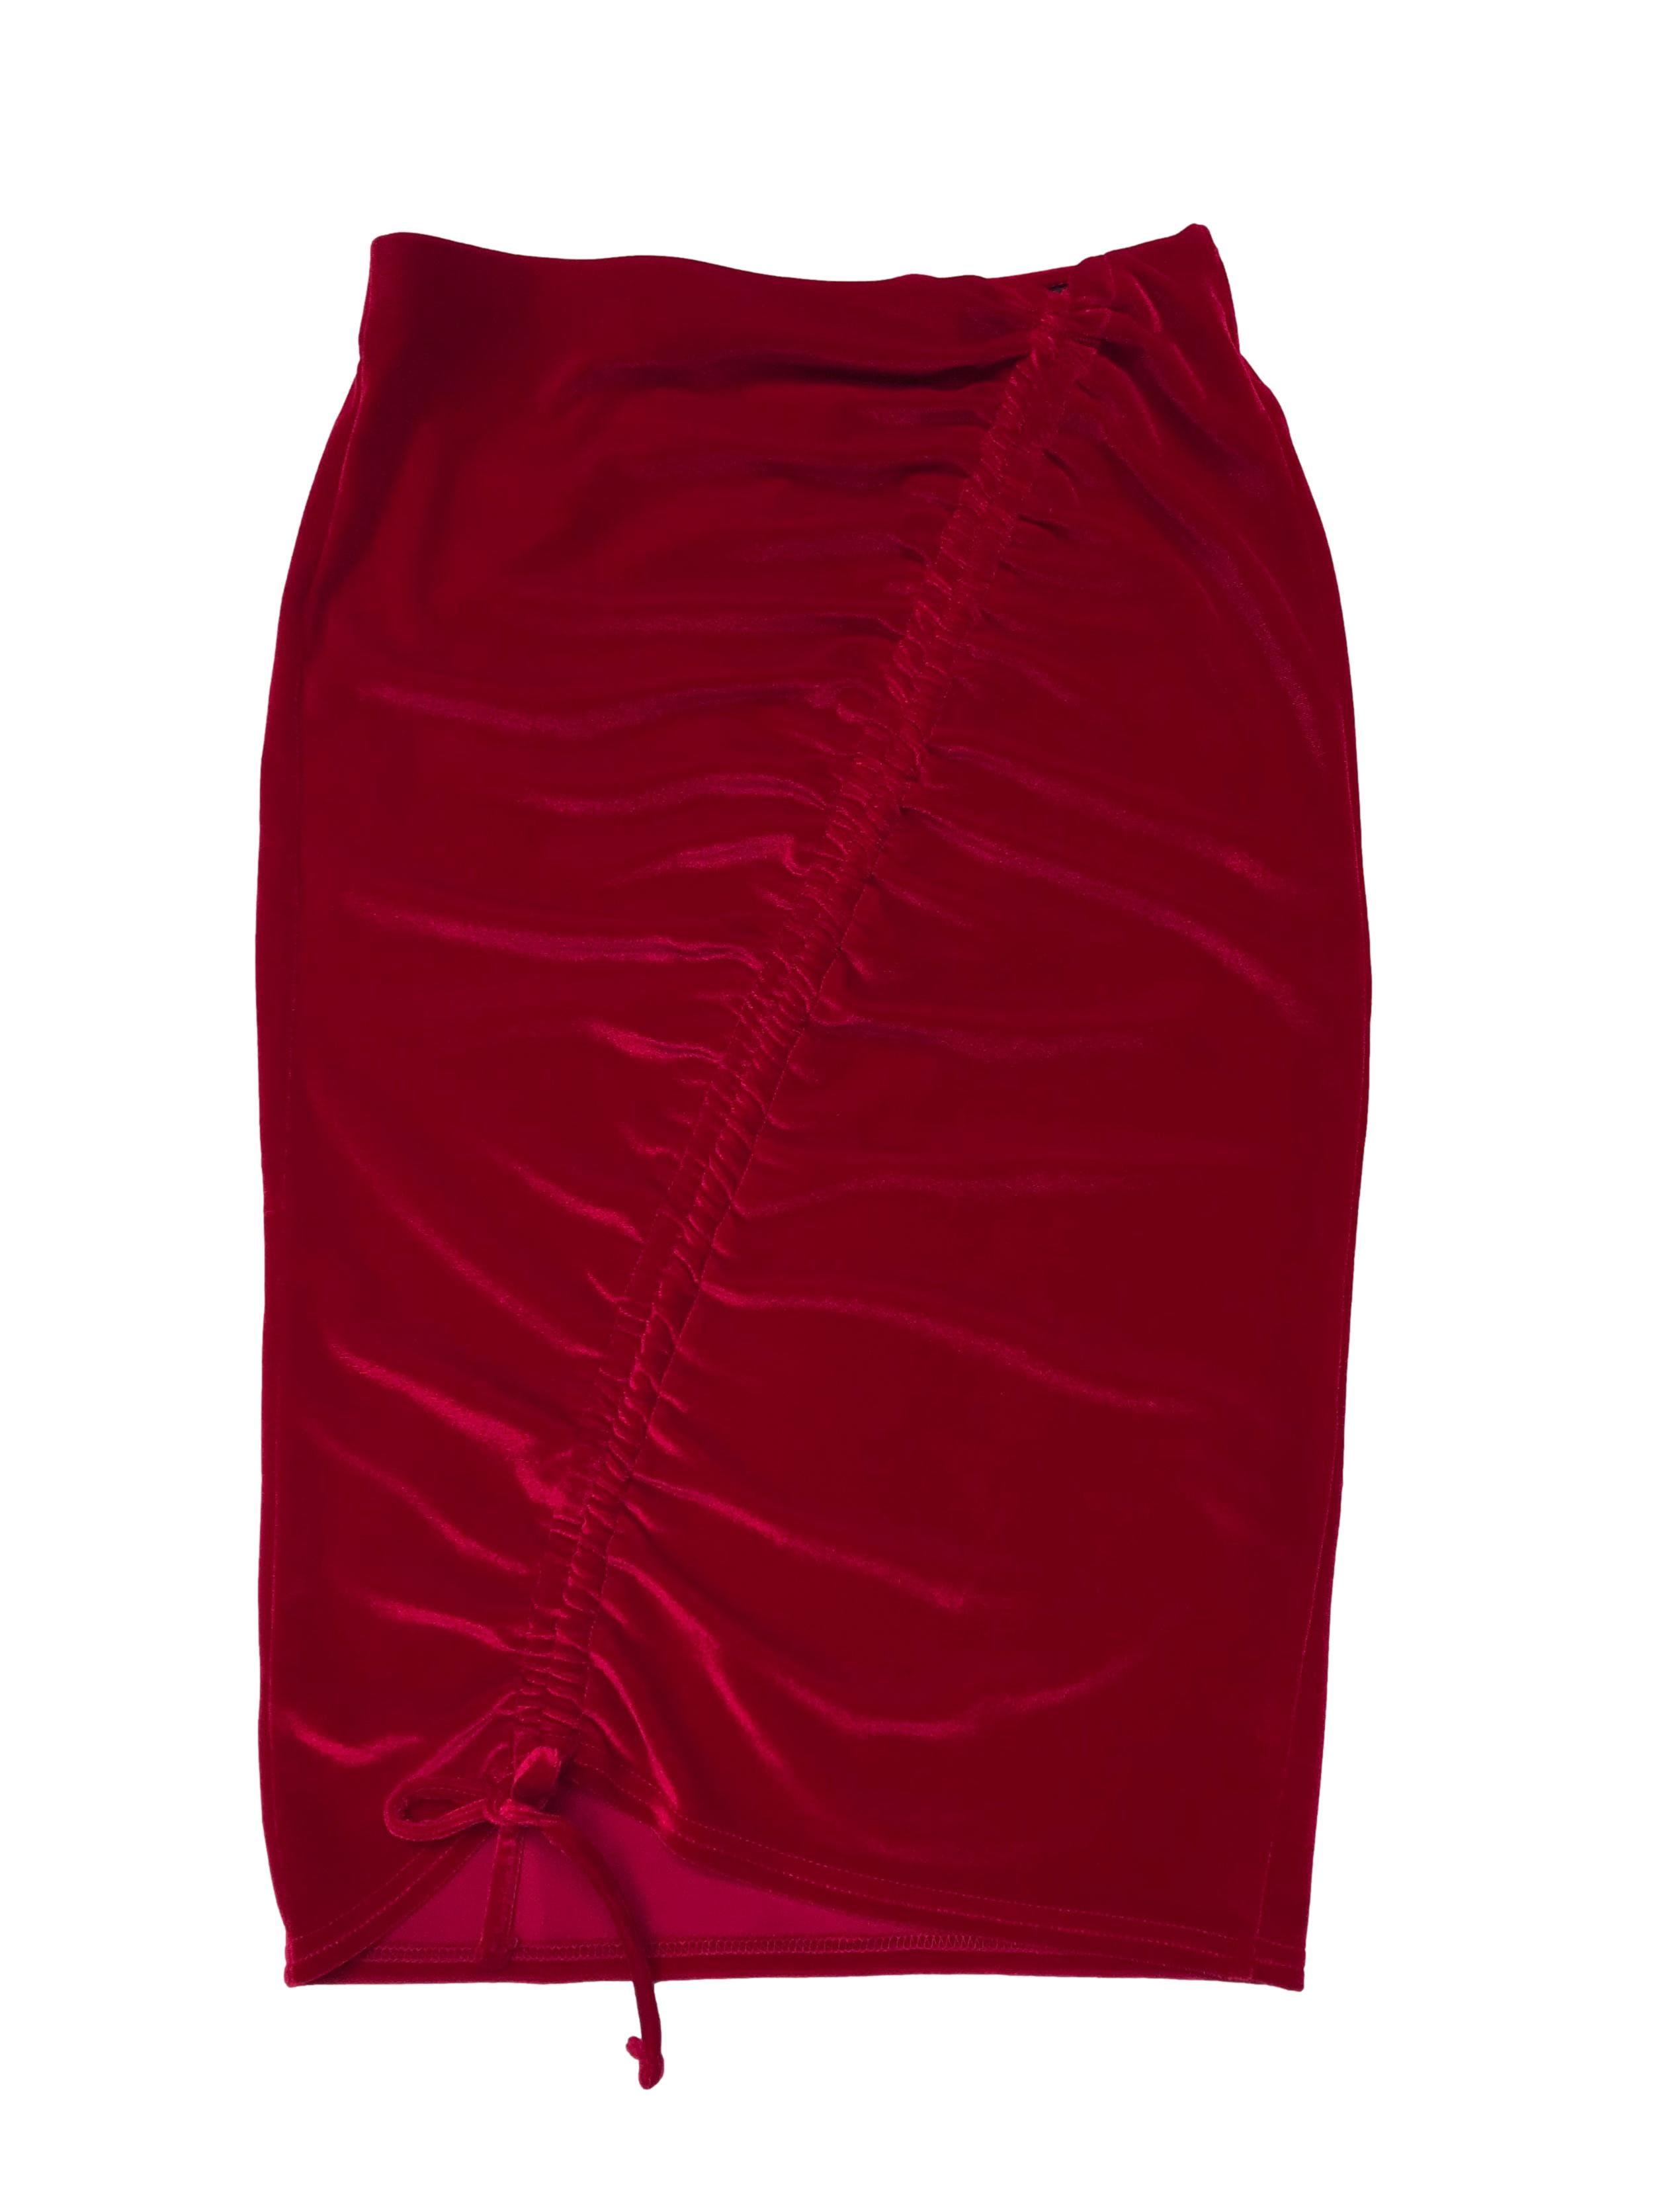 Falda midi Miss Selfridge de terciopelo rojo con drapeado diagonal con largo regulable. Cintura 75cm sin estirar Largo 68cm. Precio original S/ 189